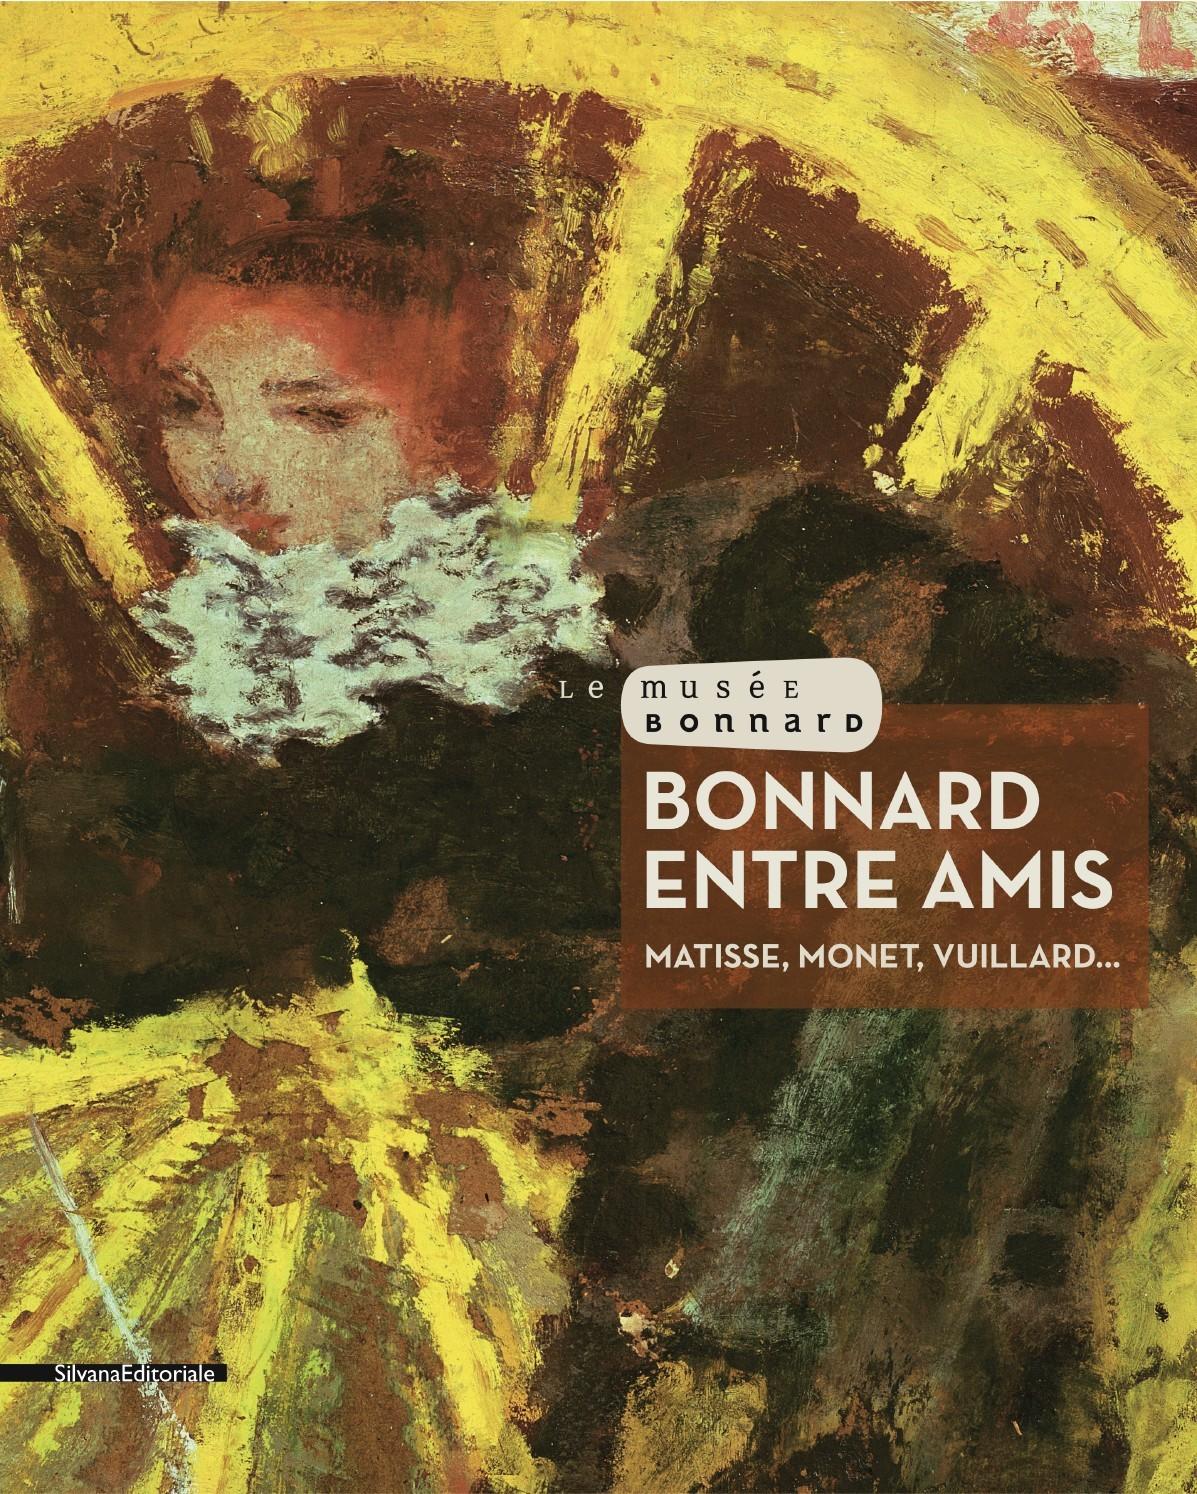 BONNARD ENTRE AMIS